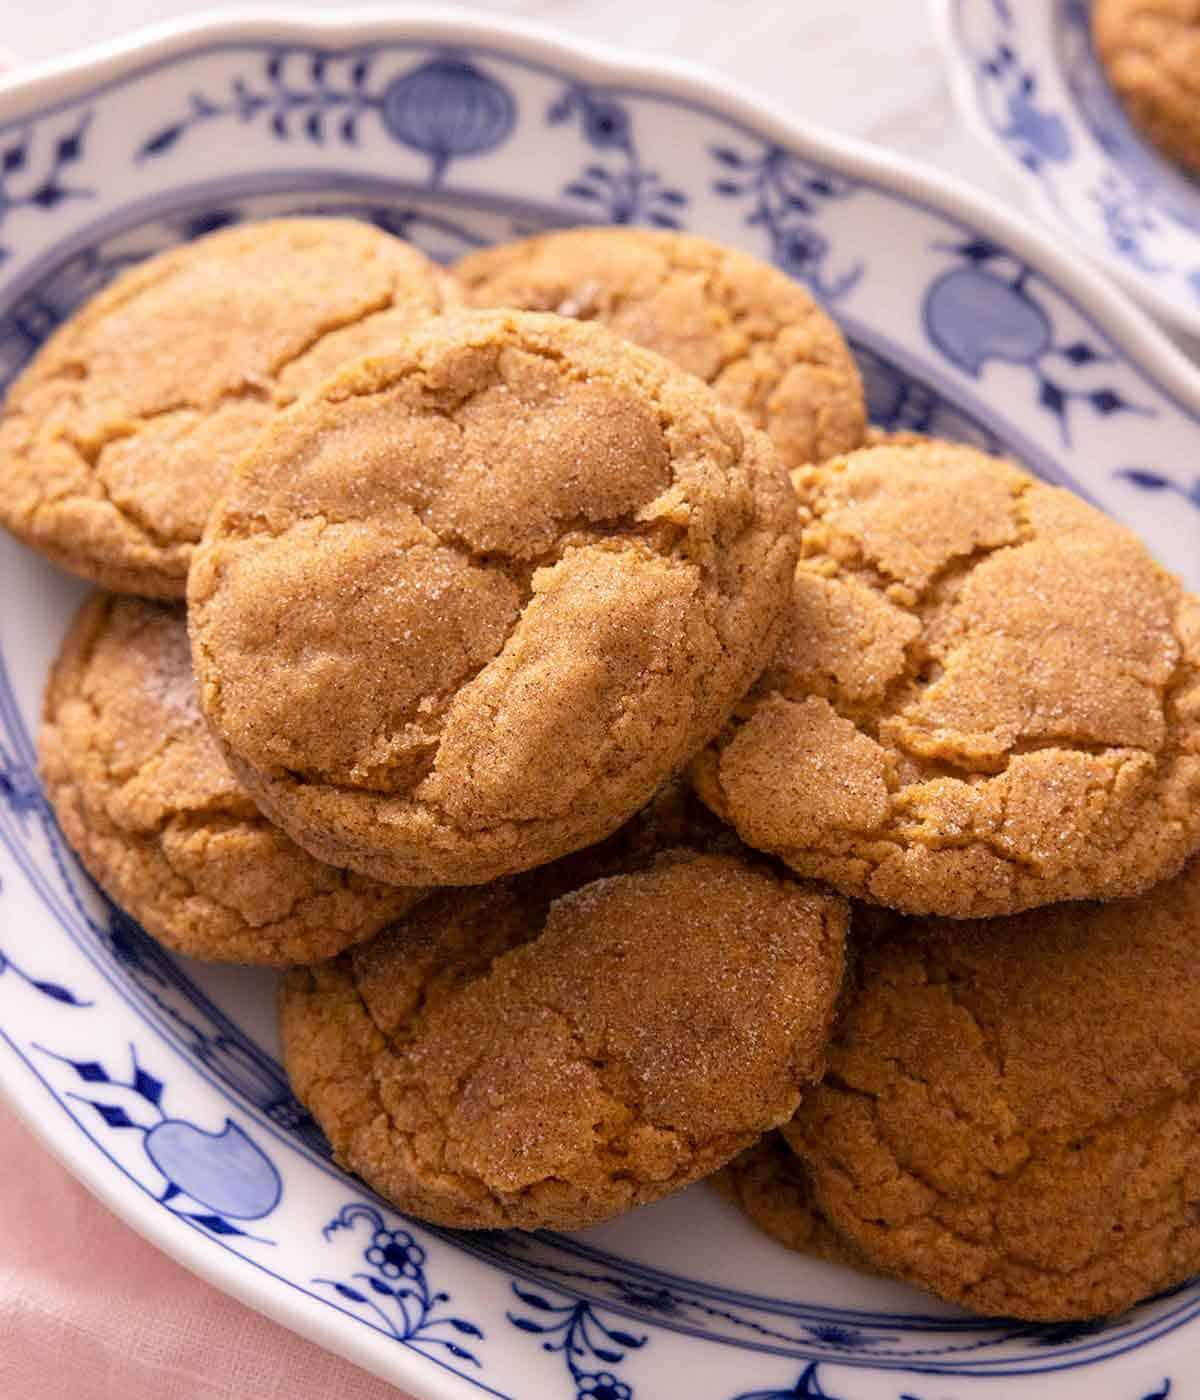 A platter of pumpkin snickerdoodles cookies.